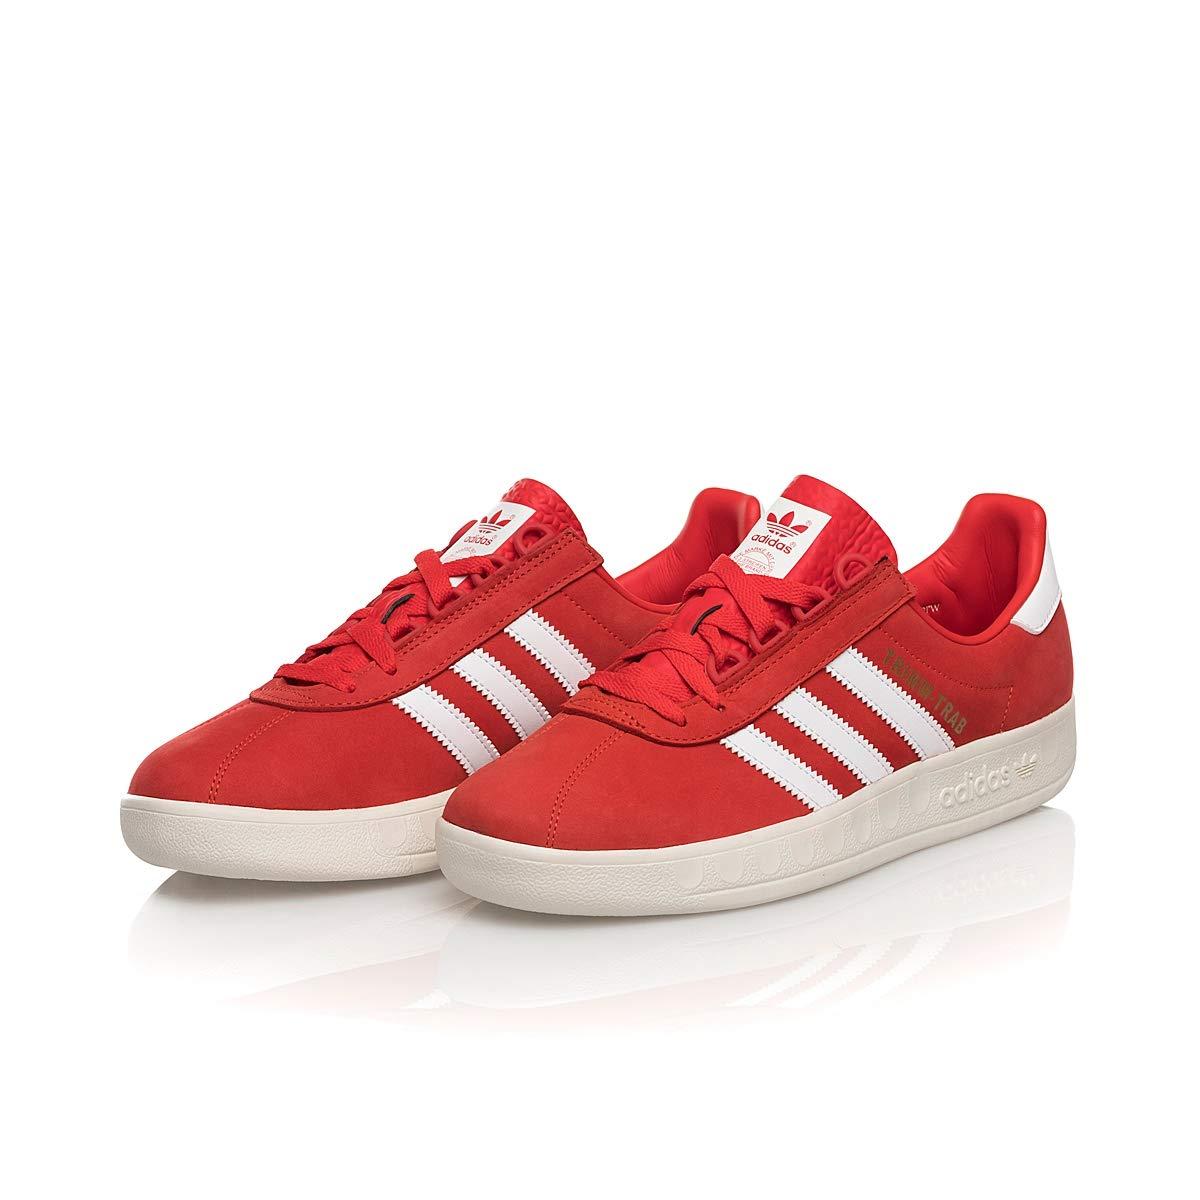 adidas Trimm Trab Samstag (navy gelb) | 43einhalb Sneaker Store